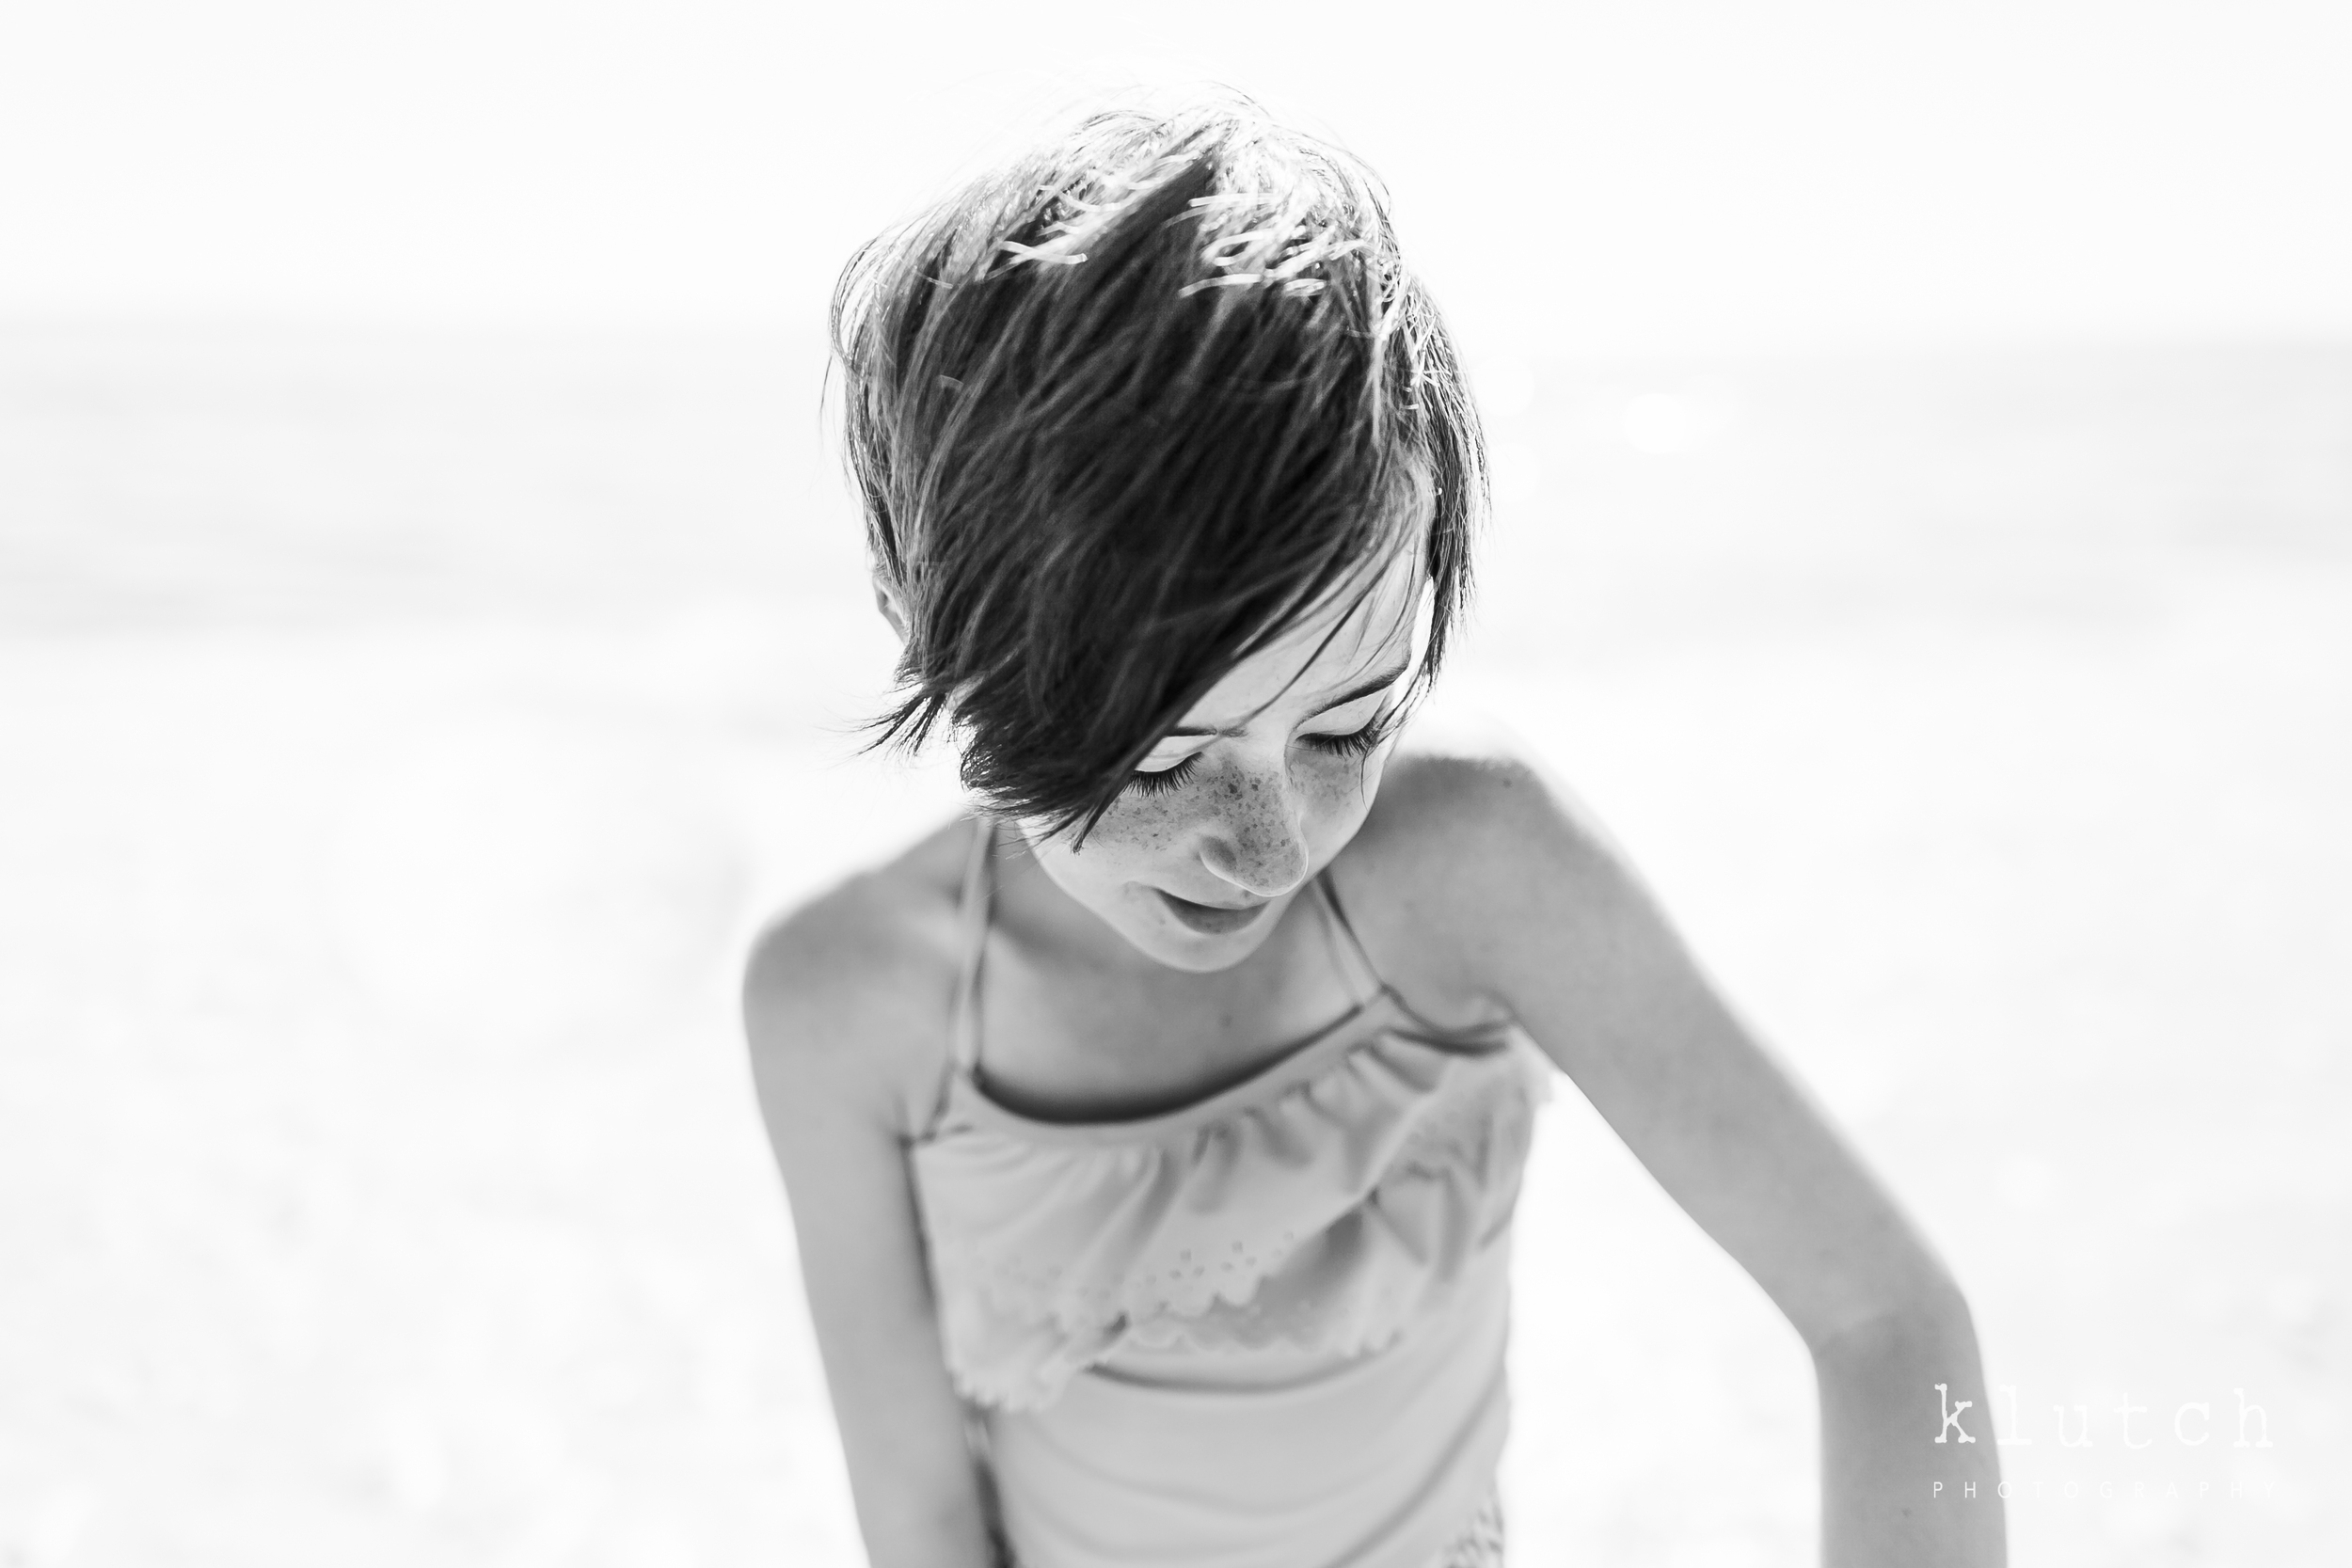 Klutch Photography,white rock family photographer, vancouver family photographer, whiterock lifestyle photographer, life unscripted photographer, life unscripted session, photography,Dina Ferreira Stoddard-6022.jpg